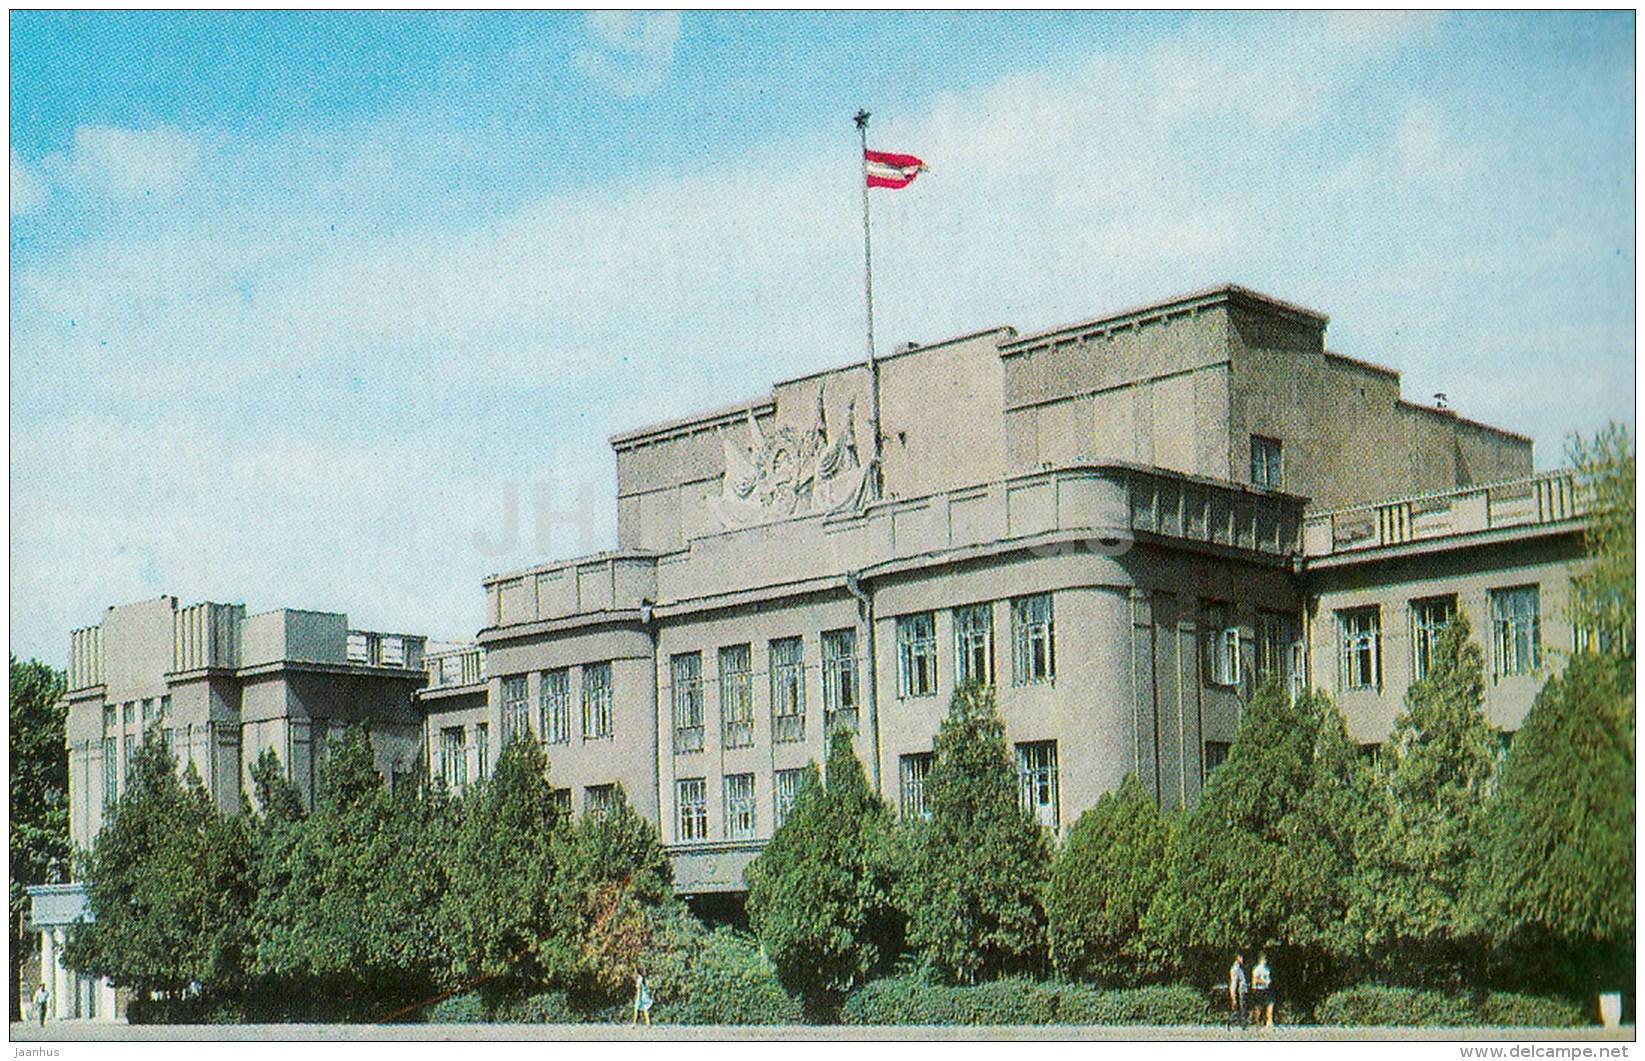 Presidium Of The Supreme Soviet Of Kyrgyz SSR - Bishkek - Frunze - 1970 - Kyrgystan USSR - Unused - Kirghizistan